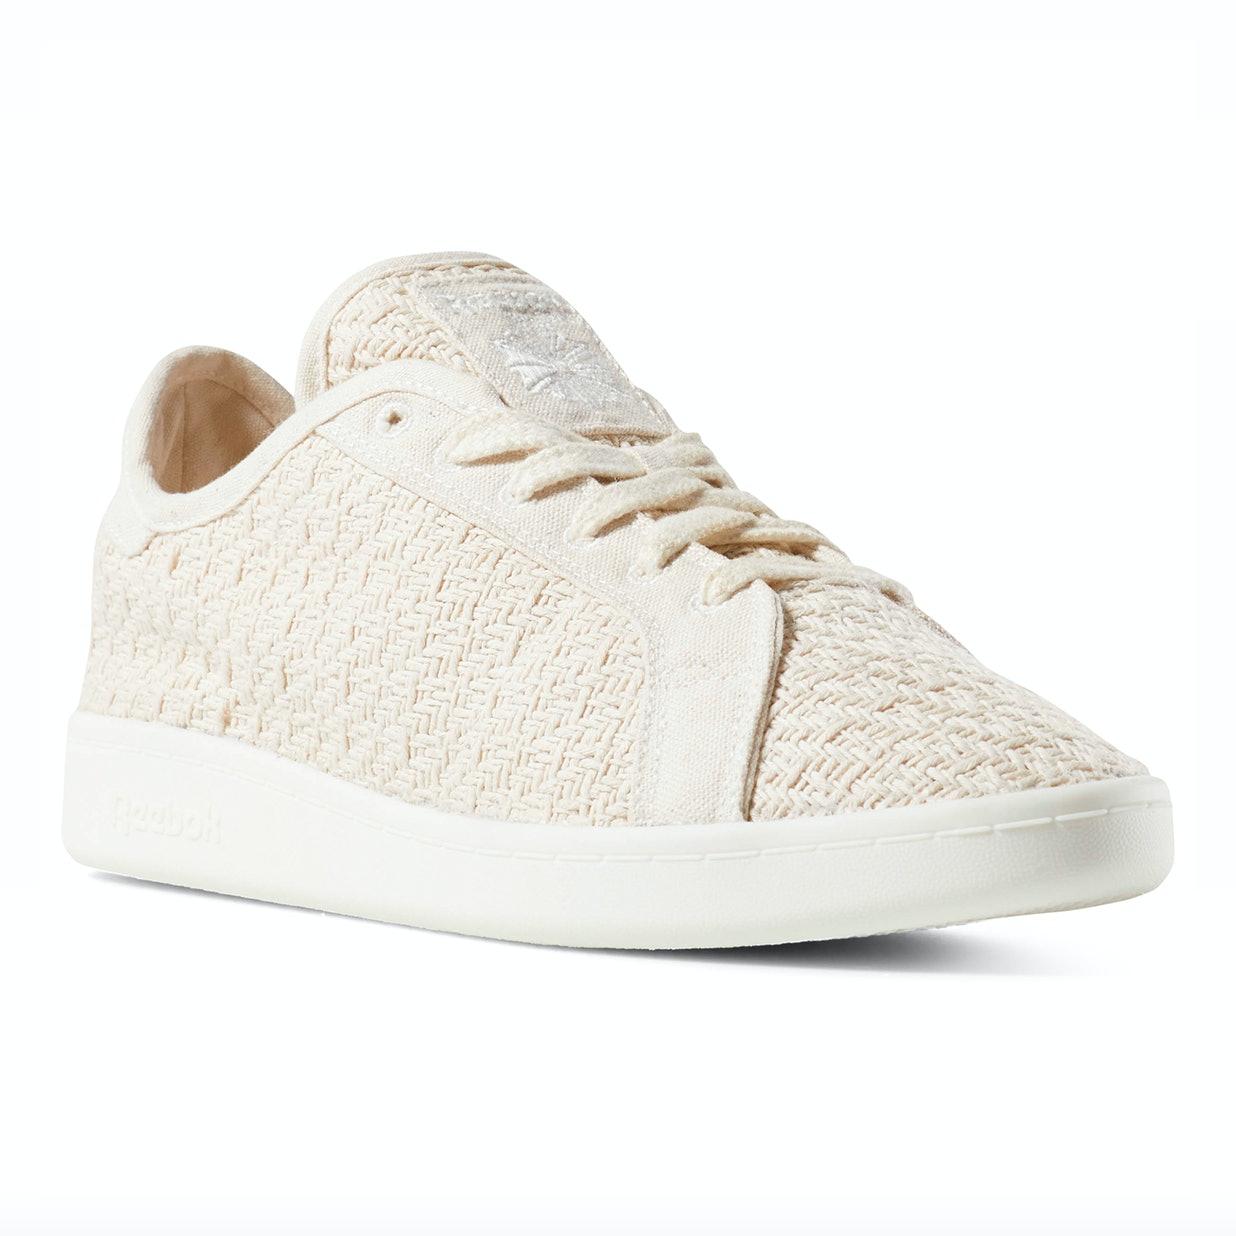 Cotton + Corn Vegan Sneakers